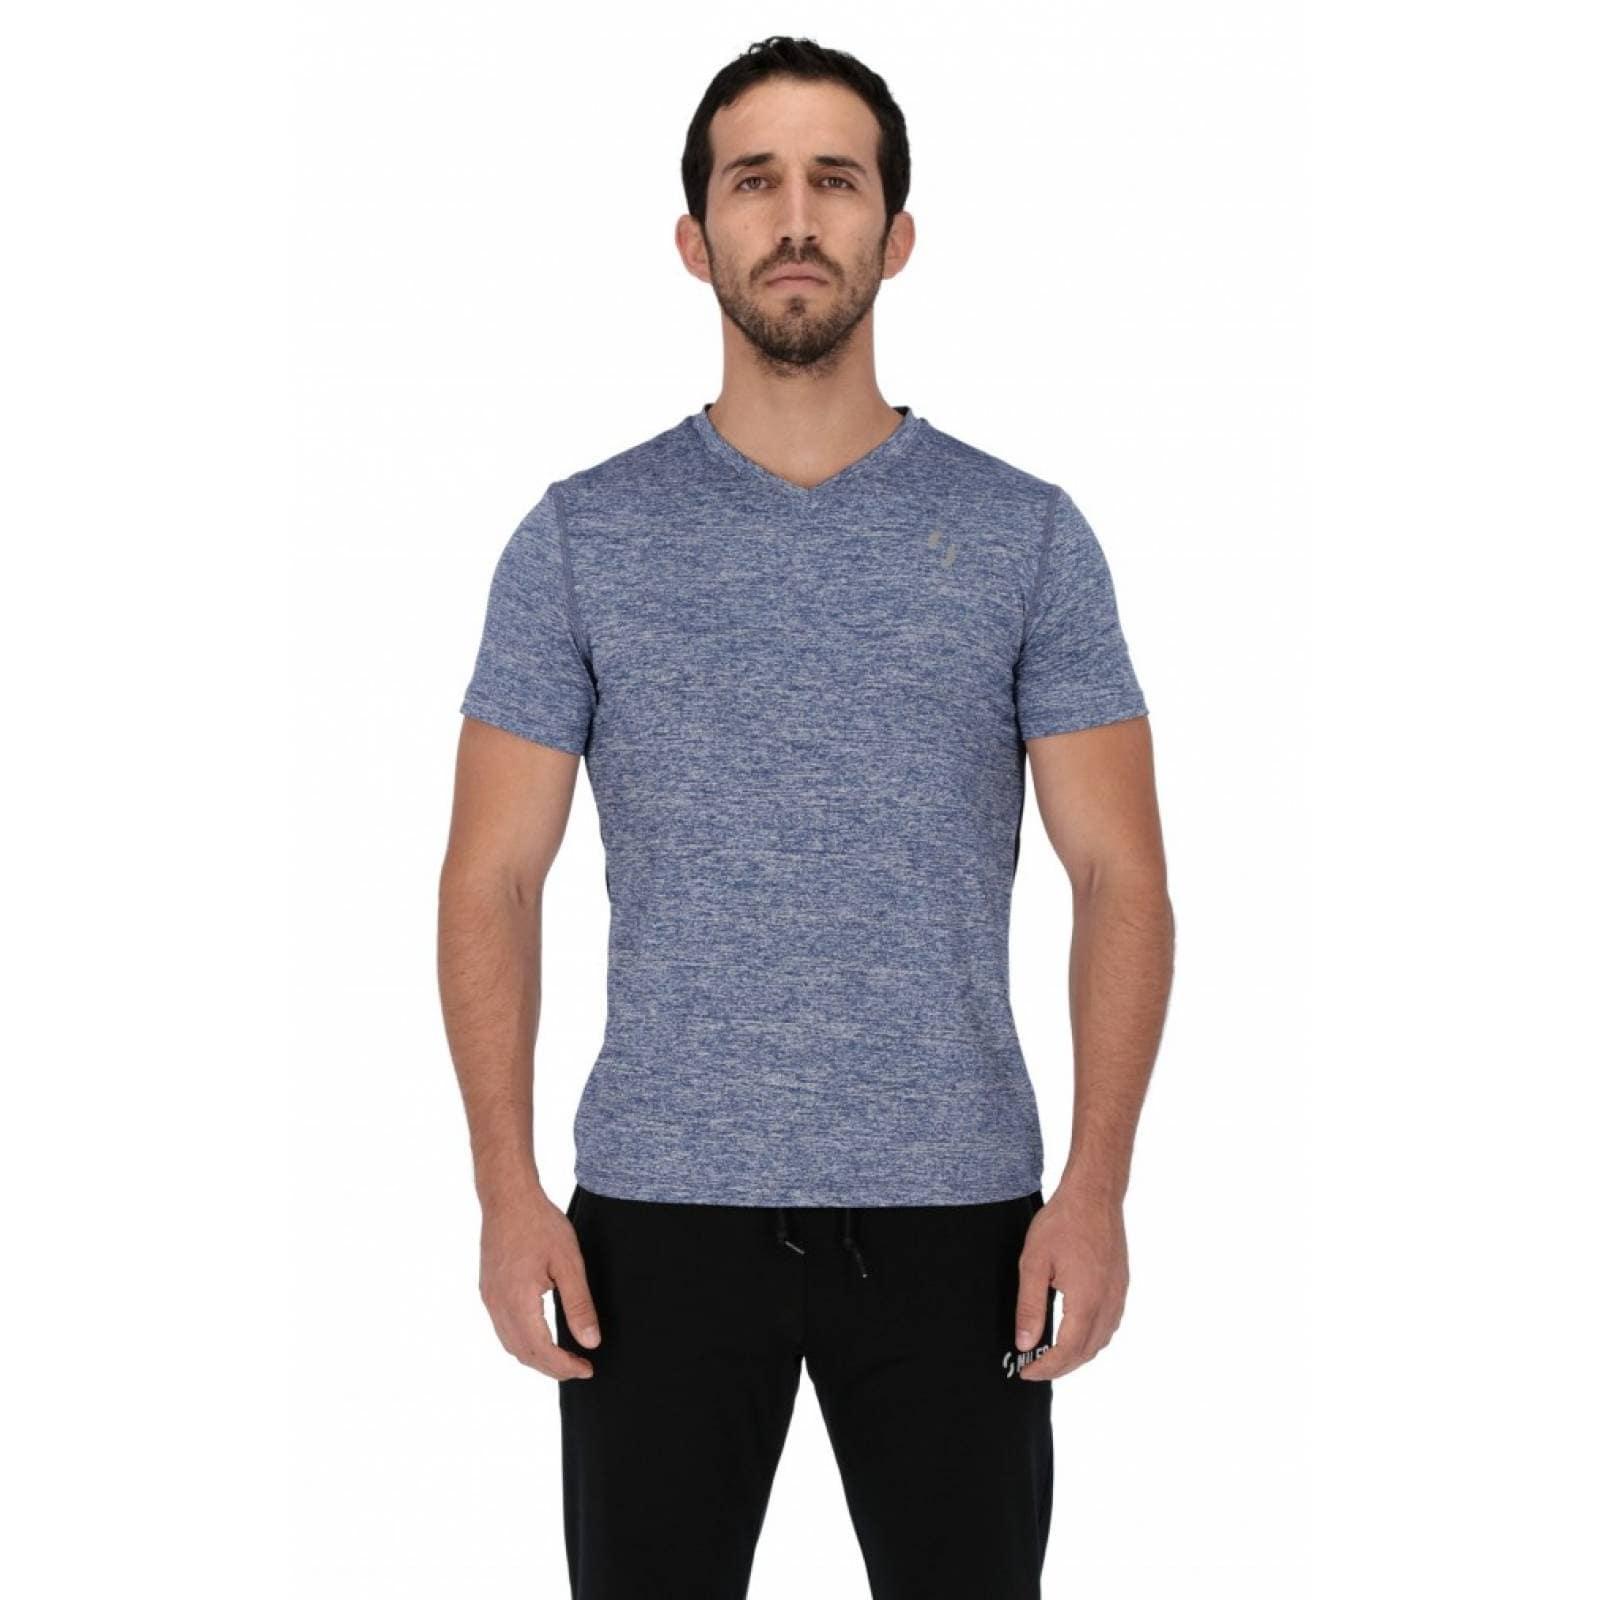 Playera Deportiva Miles Sportswear Trainer - Azul